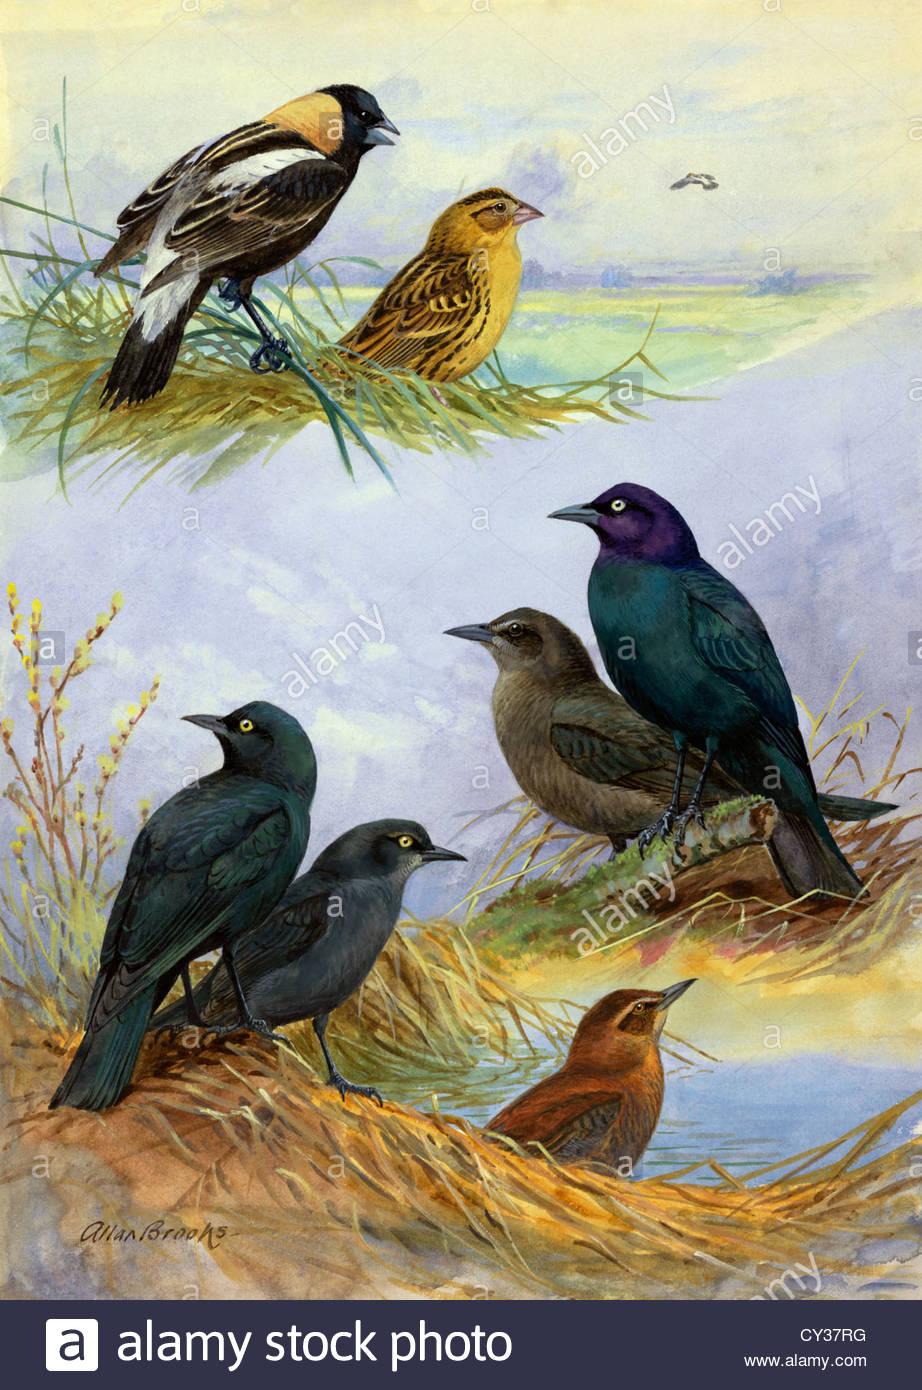 Painting of bobolinks, Brewer's blackbirds and rusty blackbirds. - Stock Image